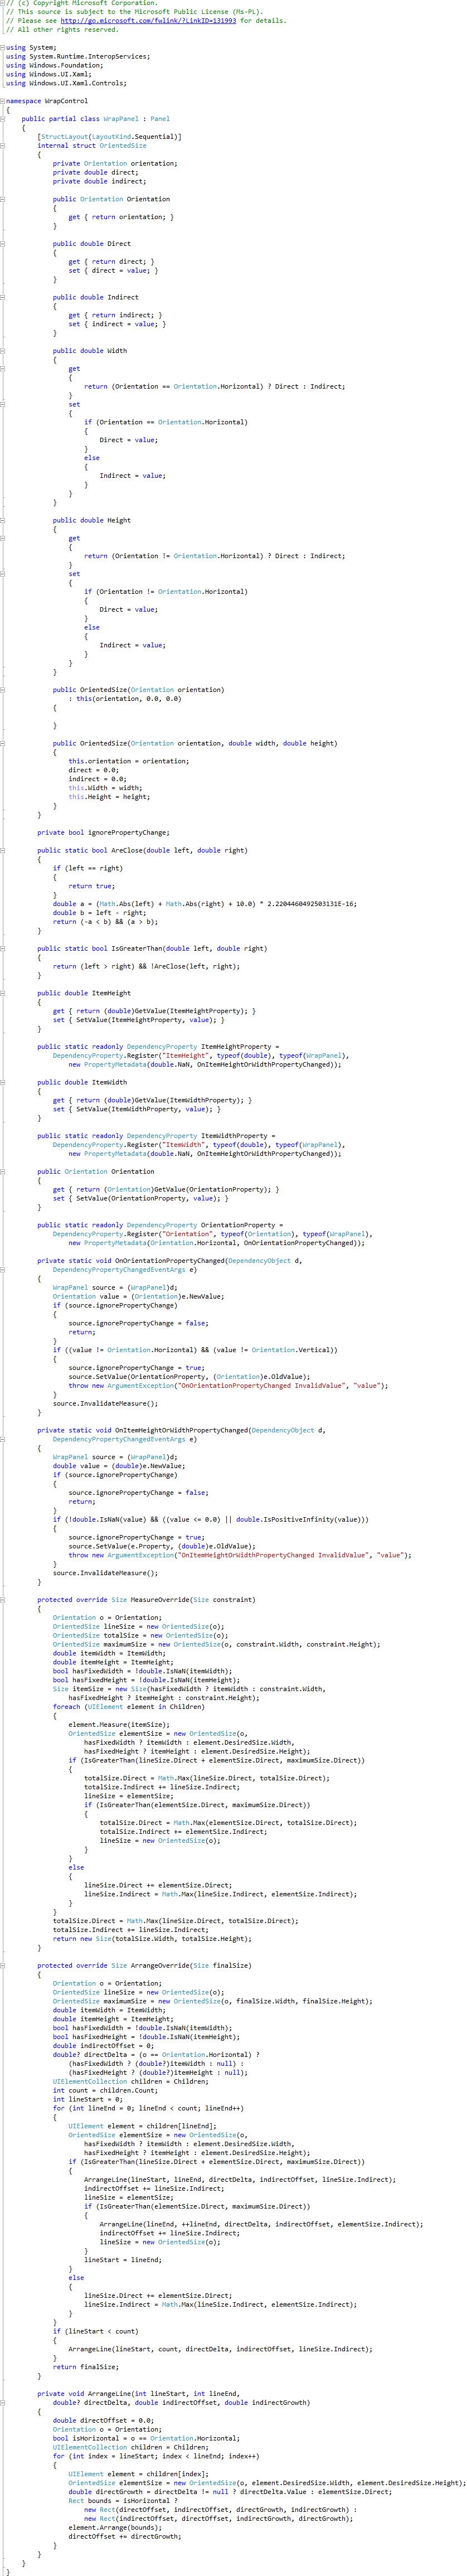 10-codefile-wrappanel